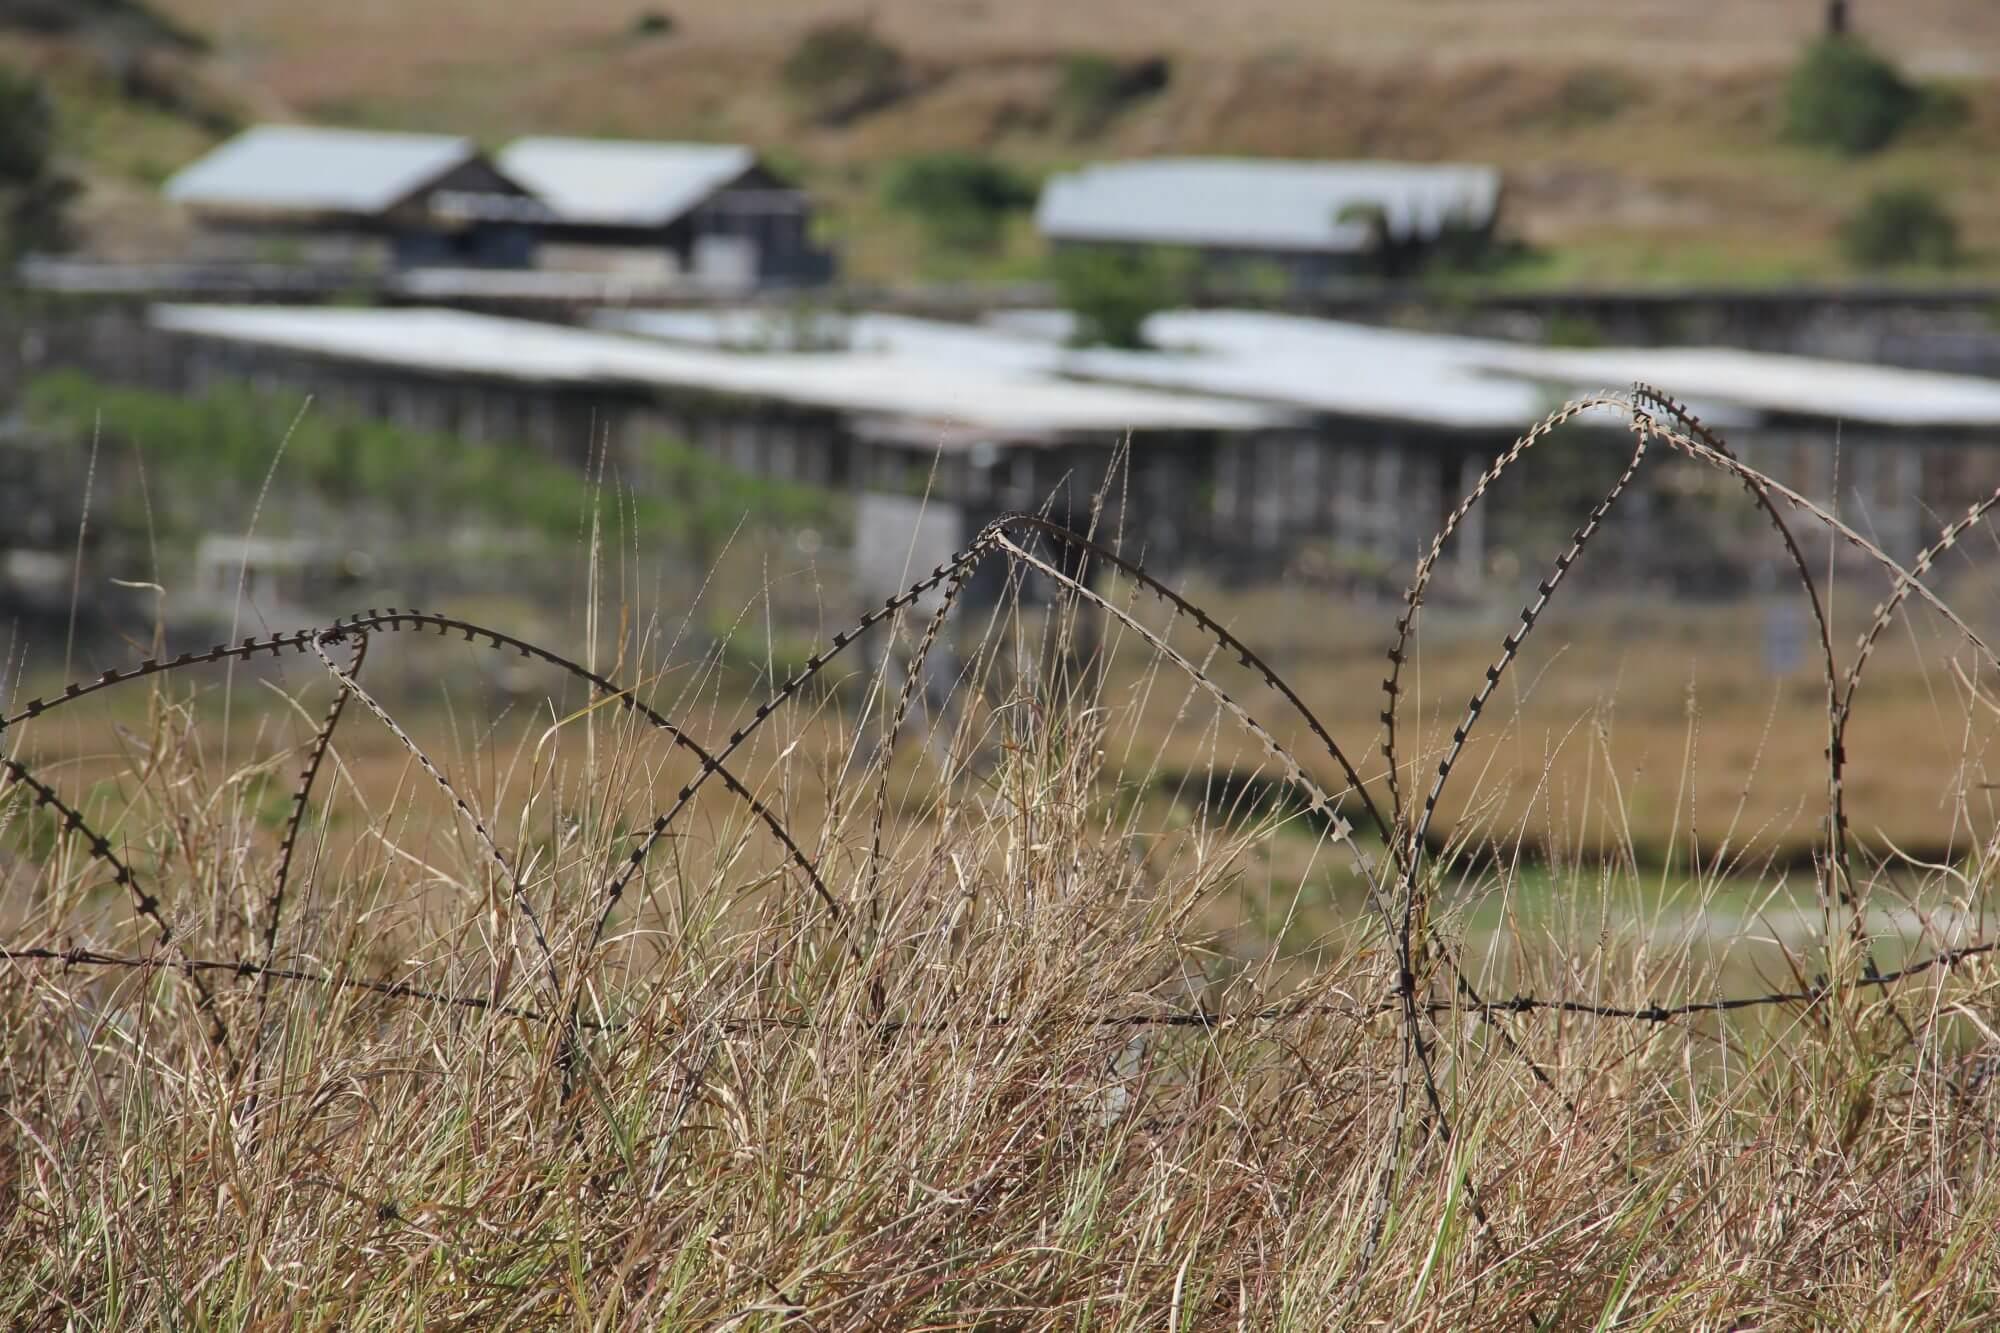 Military judge won't halt the trial of USS Cole terror suspect